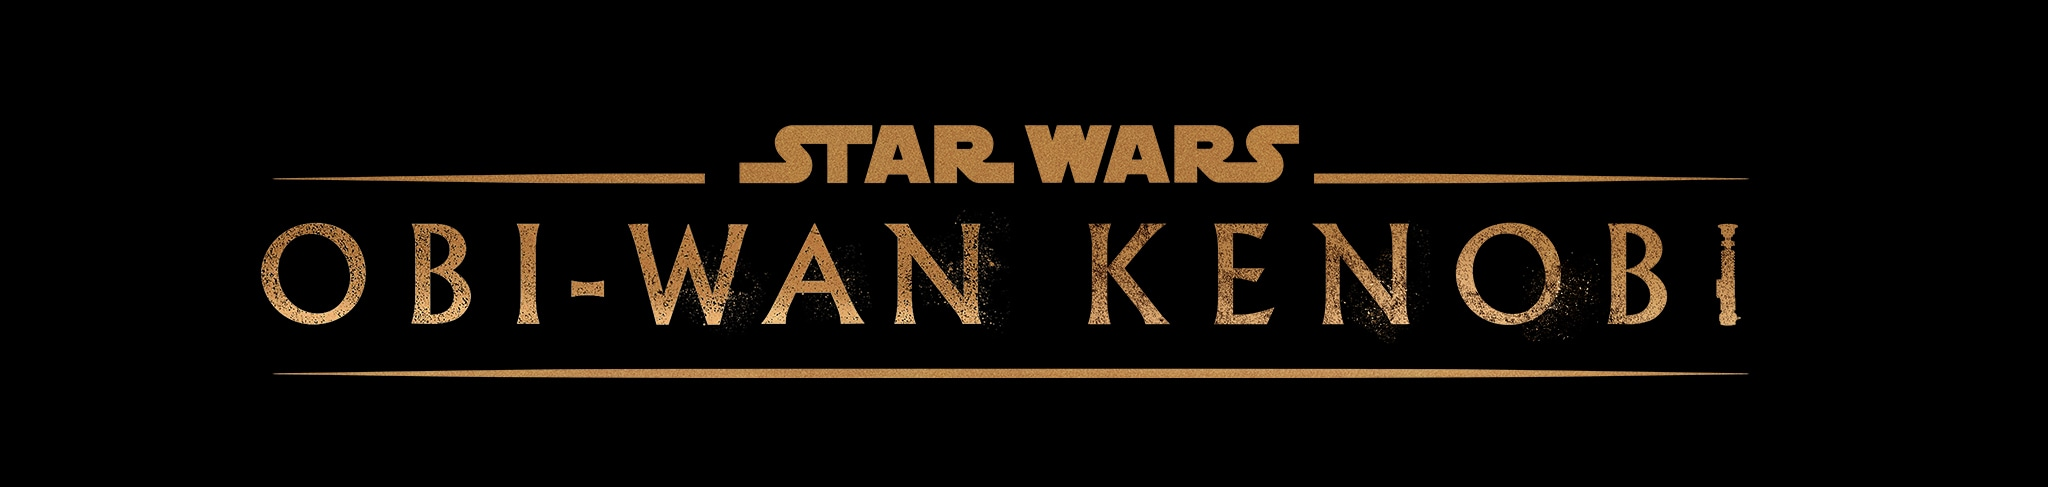 Star Wars | Obi-Wan Kenobi